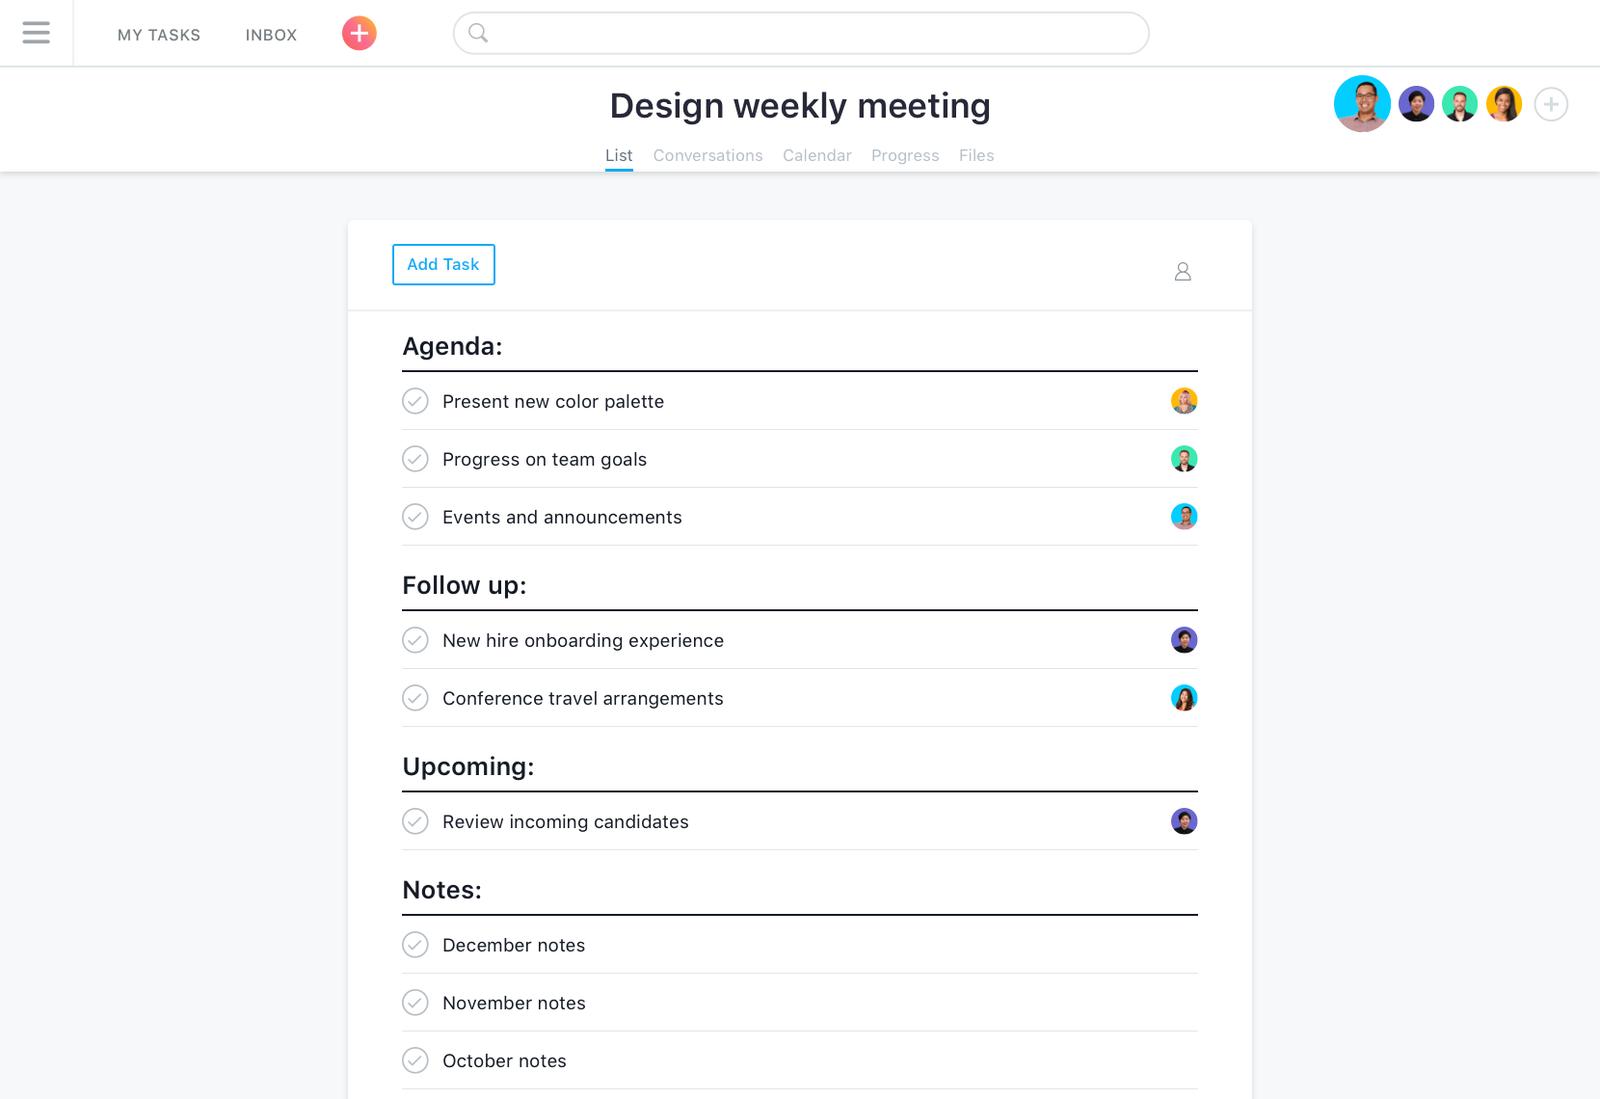 Pautas de reuniões